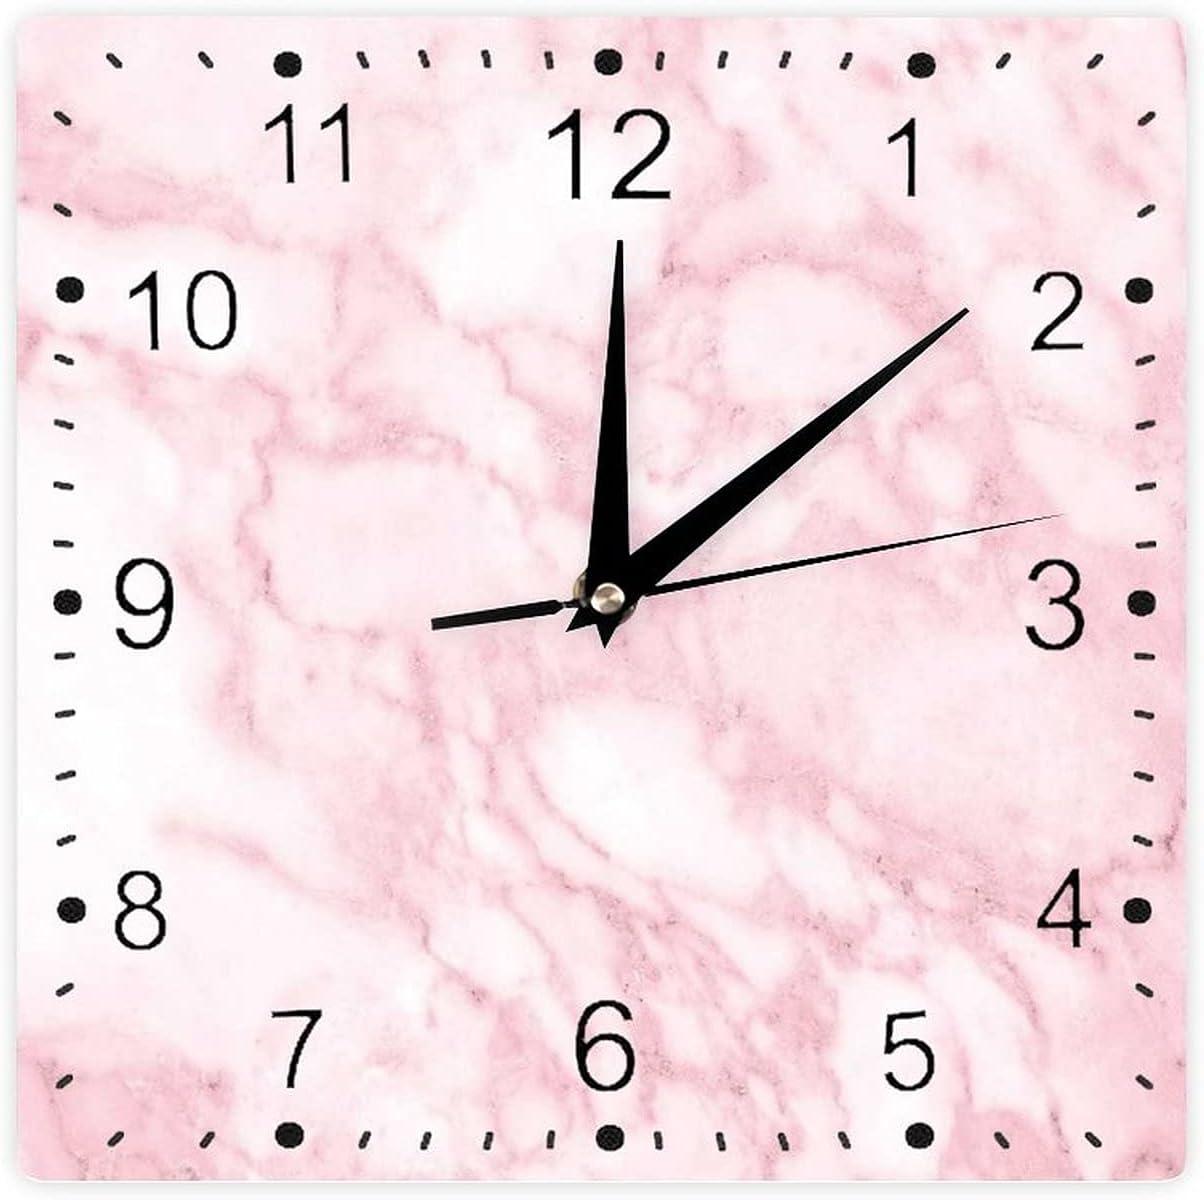 Modern Clocks Square Soft Granite Ston Fashion Space Texture Old Under New York Mall blast sales